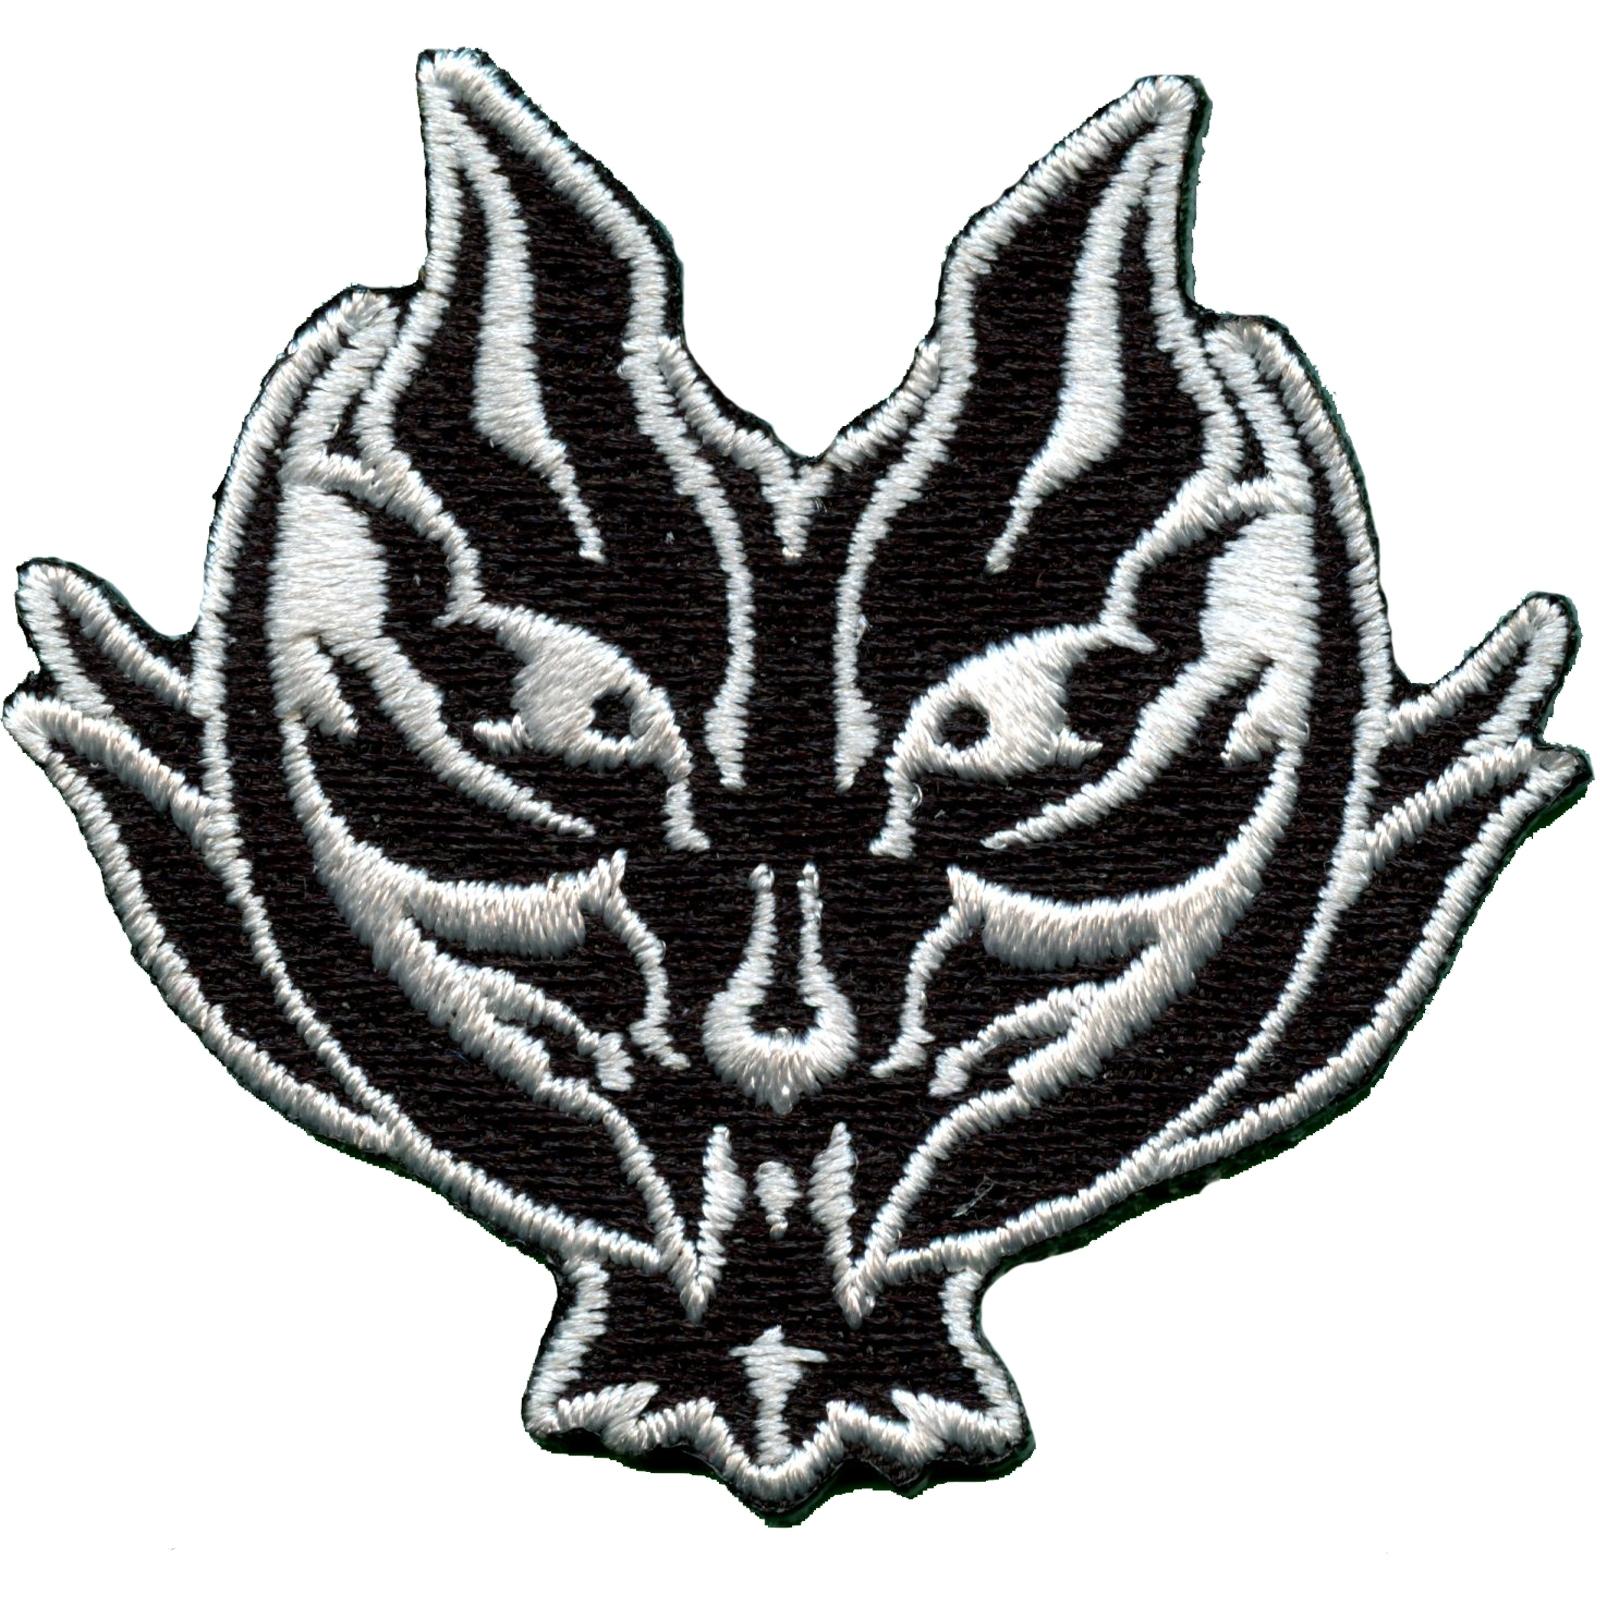 Details about God Eater Anime Fenrir Emblem Embroidered Patch.